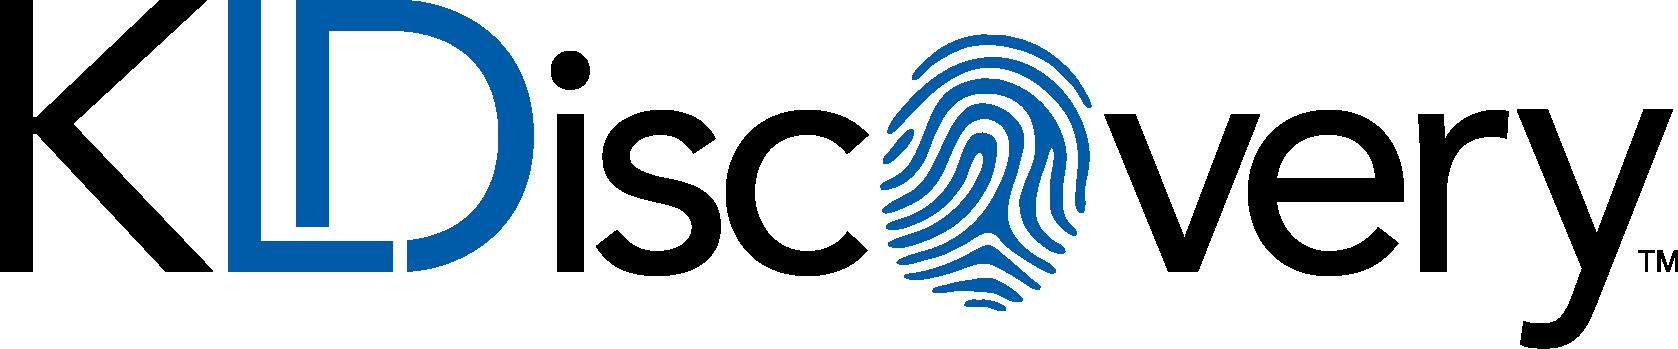 KLDiscovery Logo